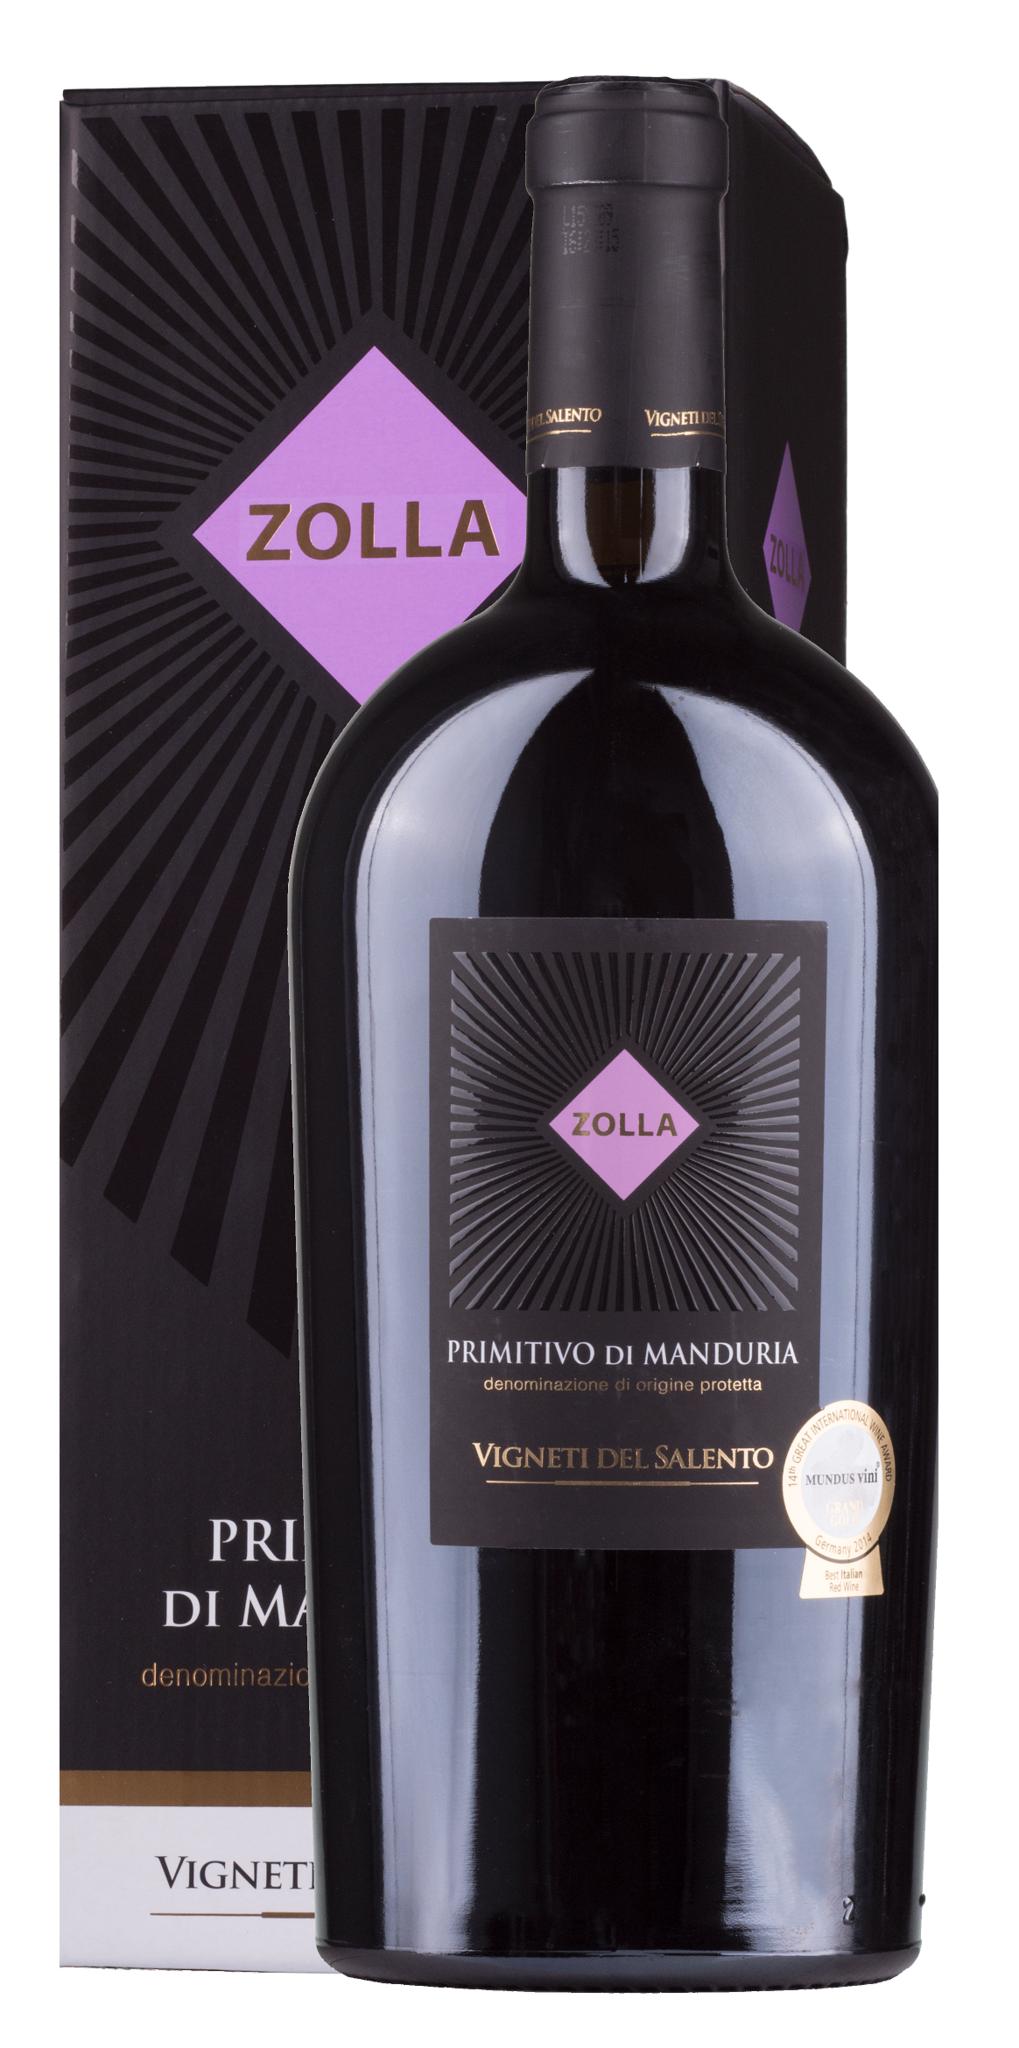 Farnese, Mittel- & Süditalien 2016 Primitivo di Manduria Zolla 1,5L in Geschenkbox